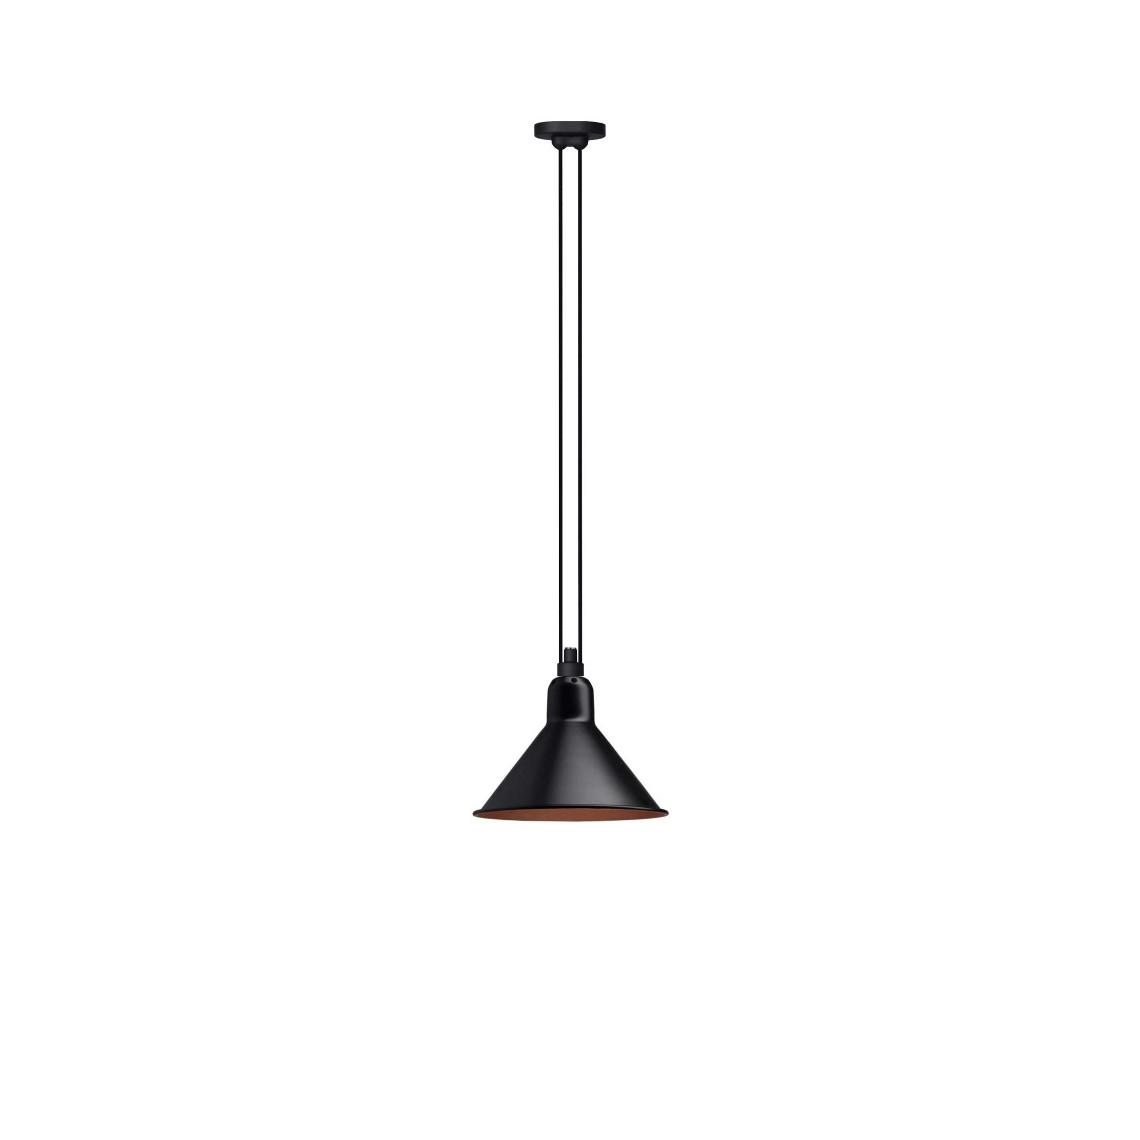 Les Acrobates de Gras No 322 - Conic L Black / Copper